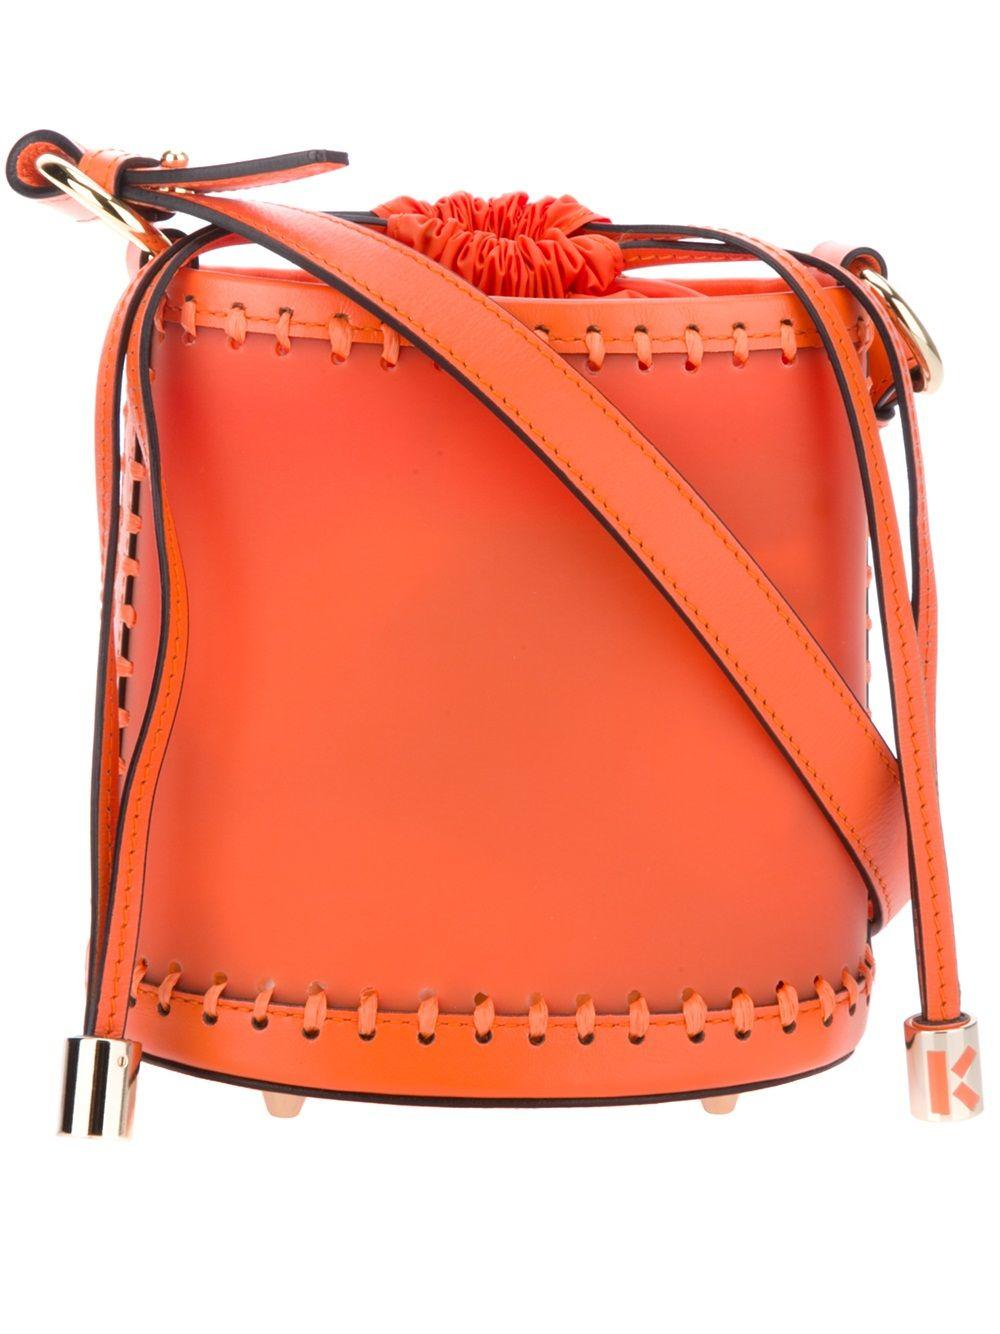 9ea4145bcc KENZO BUCKET BAG farfetch from Dante 5 Women available from farfetch.com  •ƒƒ•